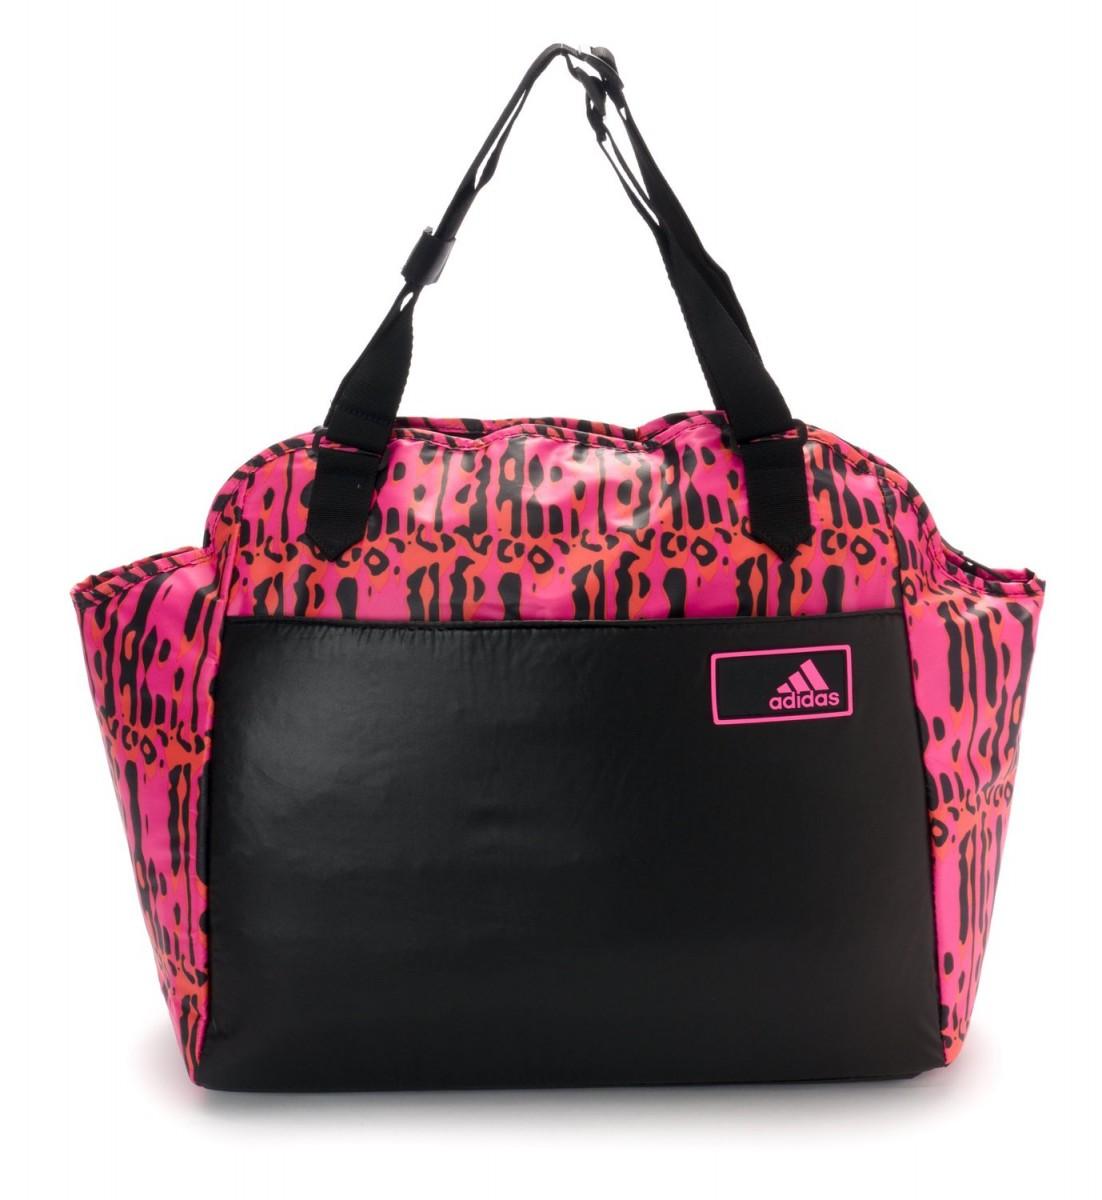 ebb596038 Bolsa Adidas Favour Tote Grafica W - Feminina | Treino e Corrida